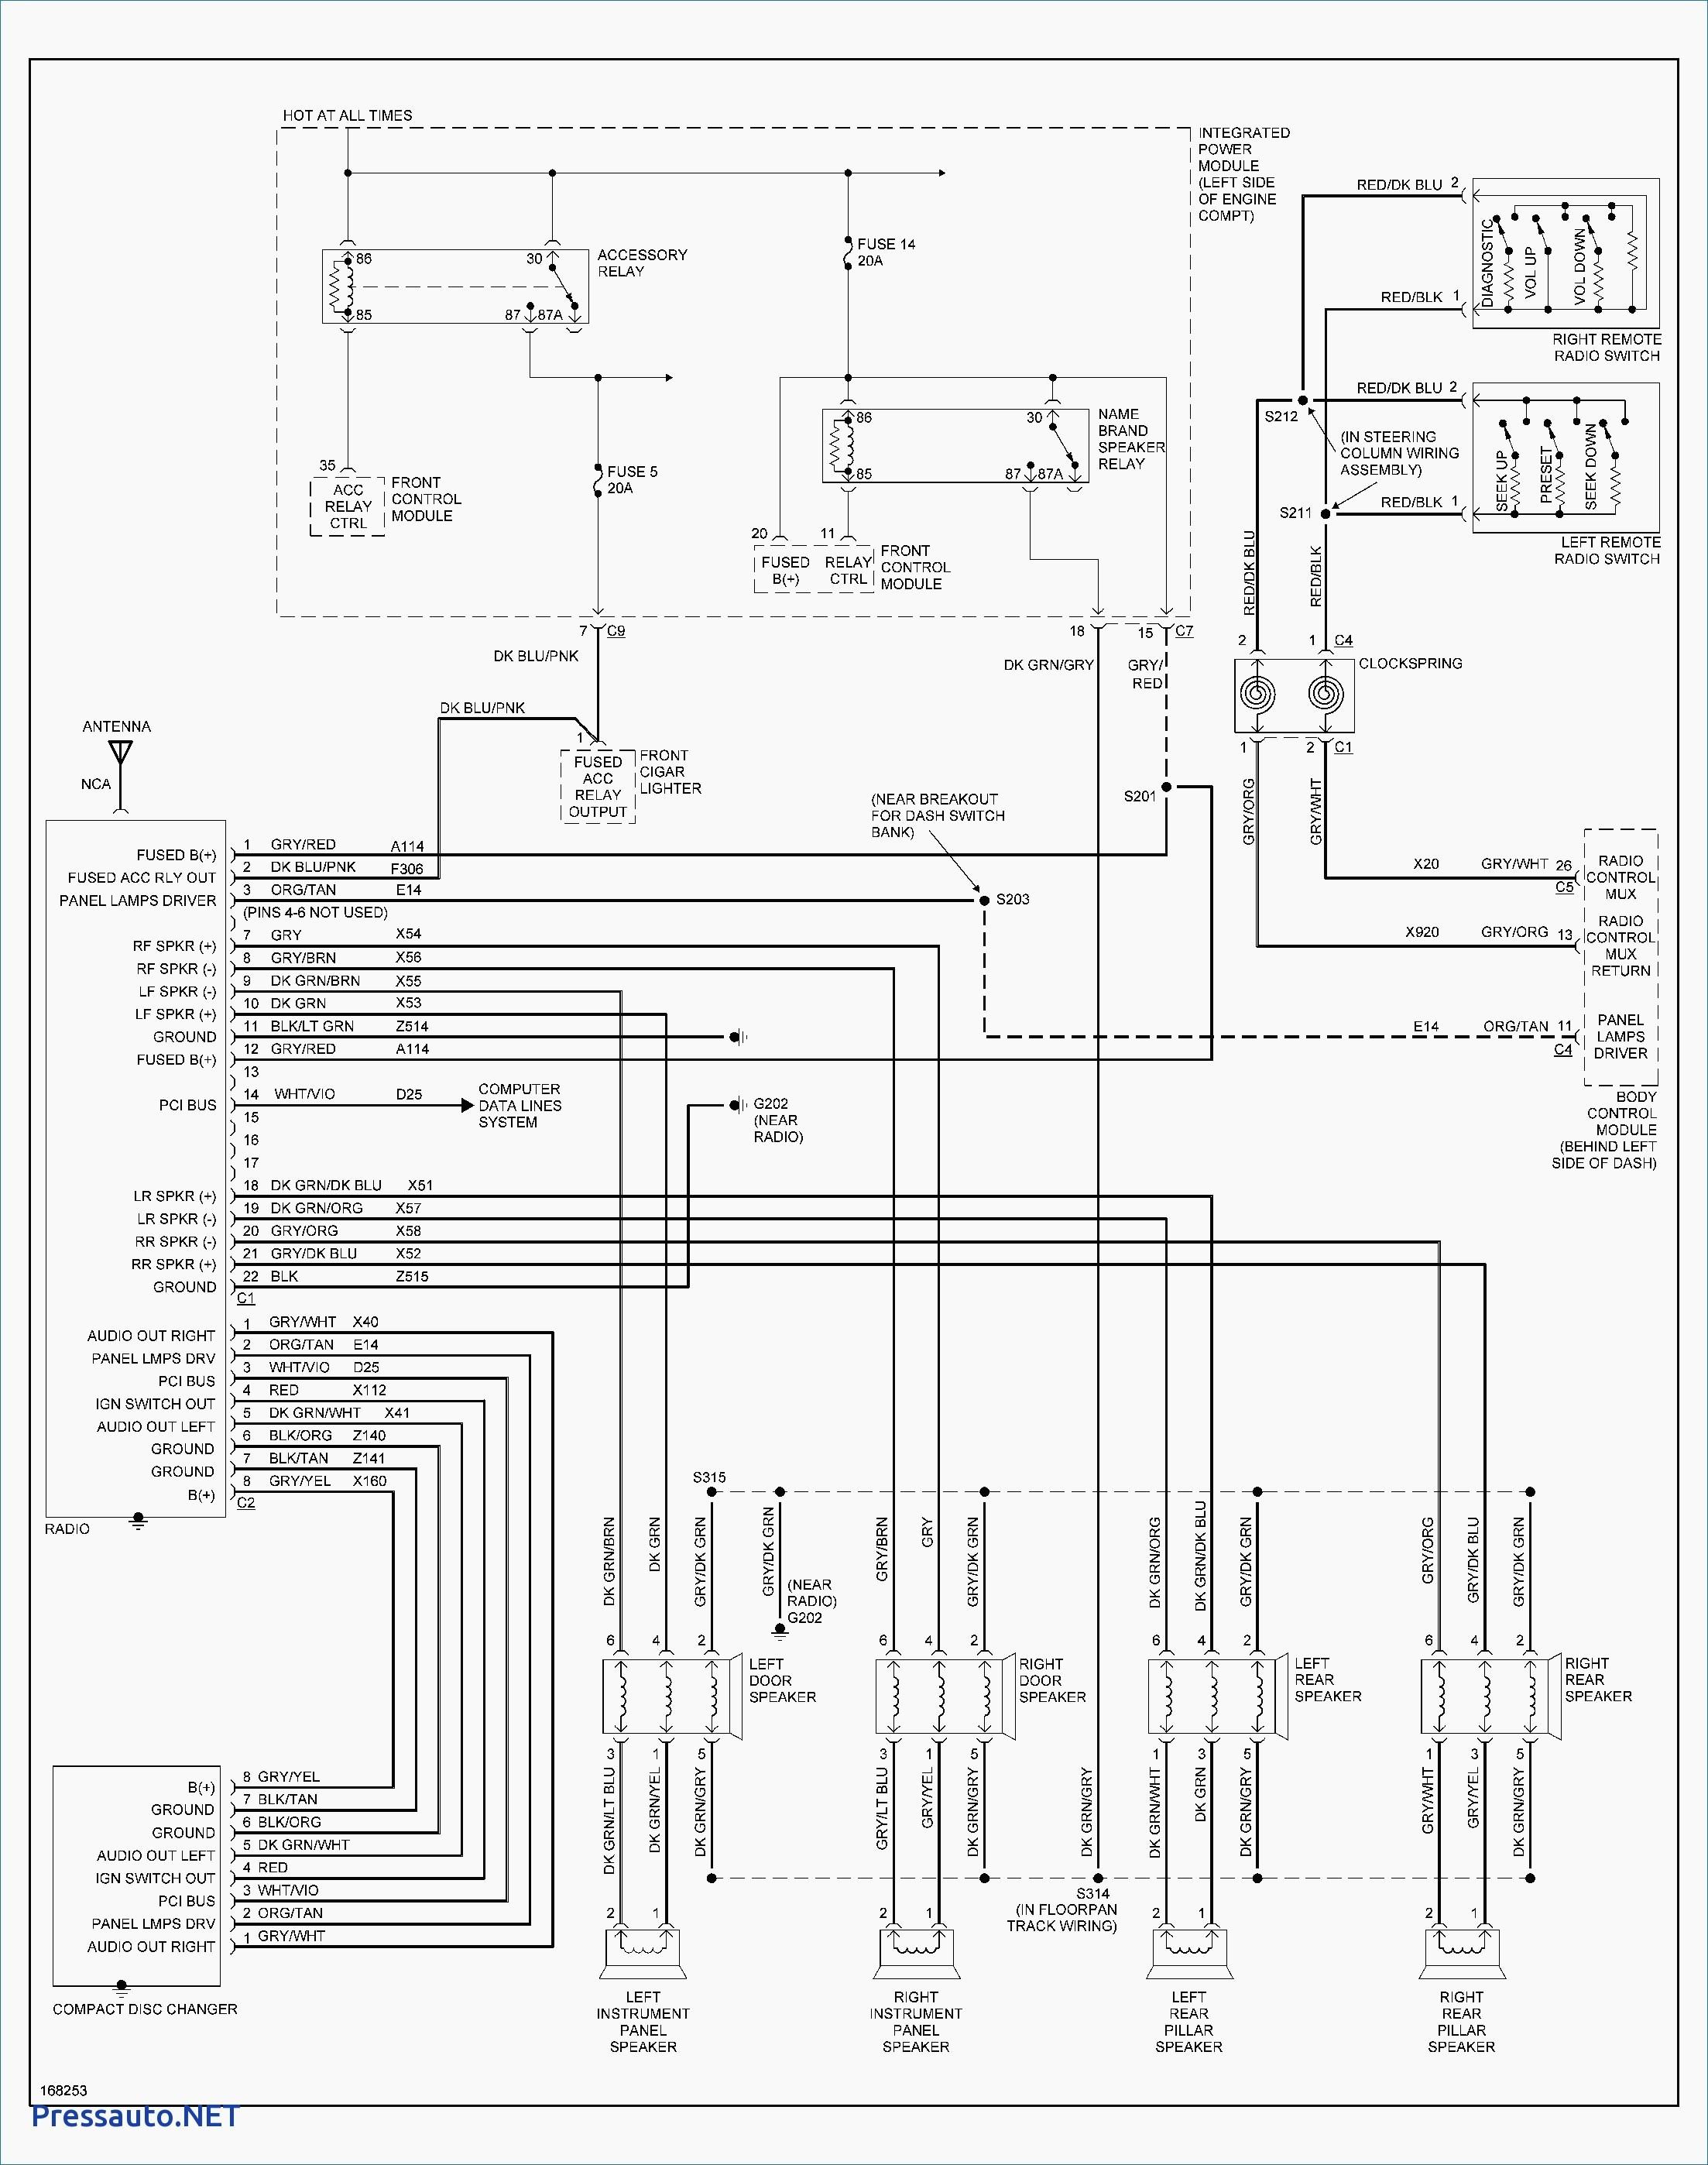 01 Dodge Ram Radio Wiring Diagram Book Of Stereo Wiring Diagram 2001 - 2001 Dodge Ram Radio Wiring Diagram